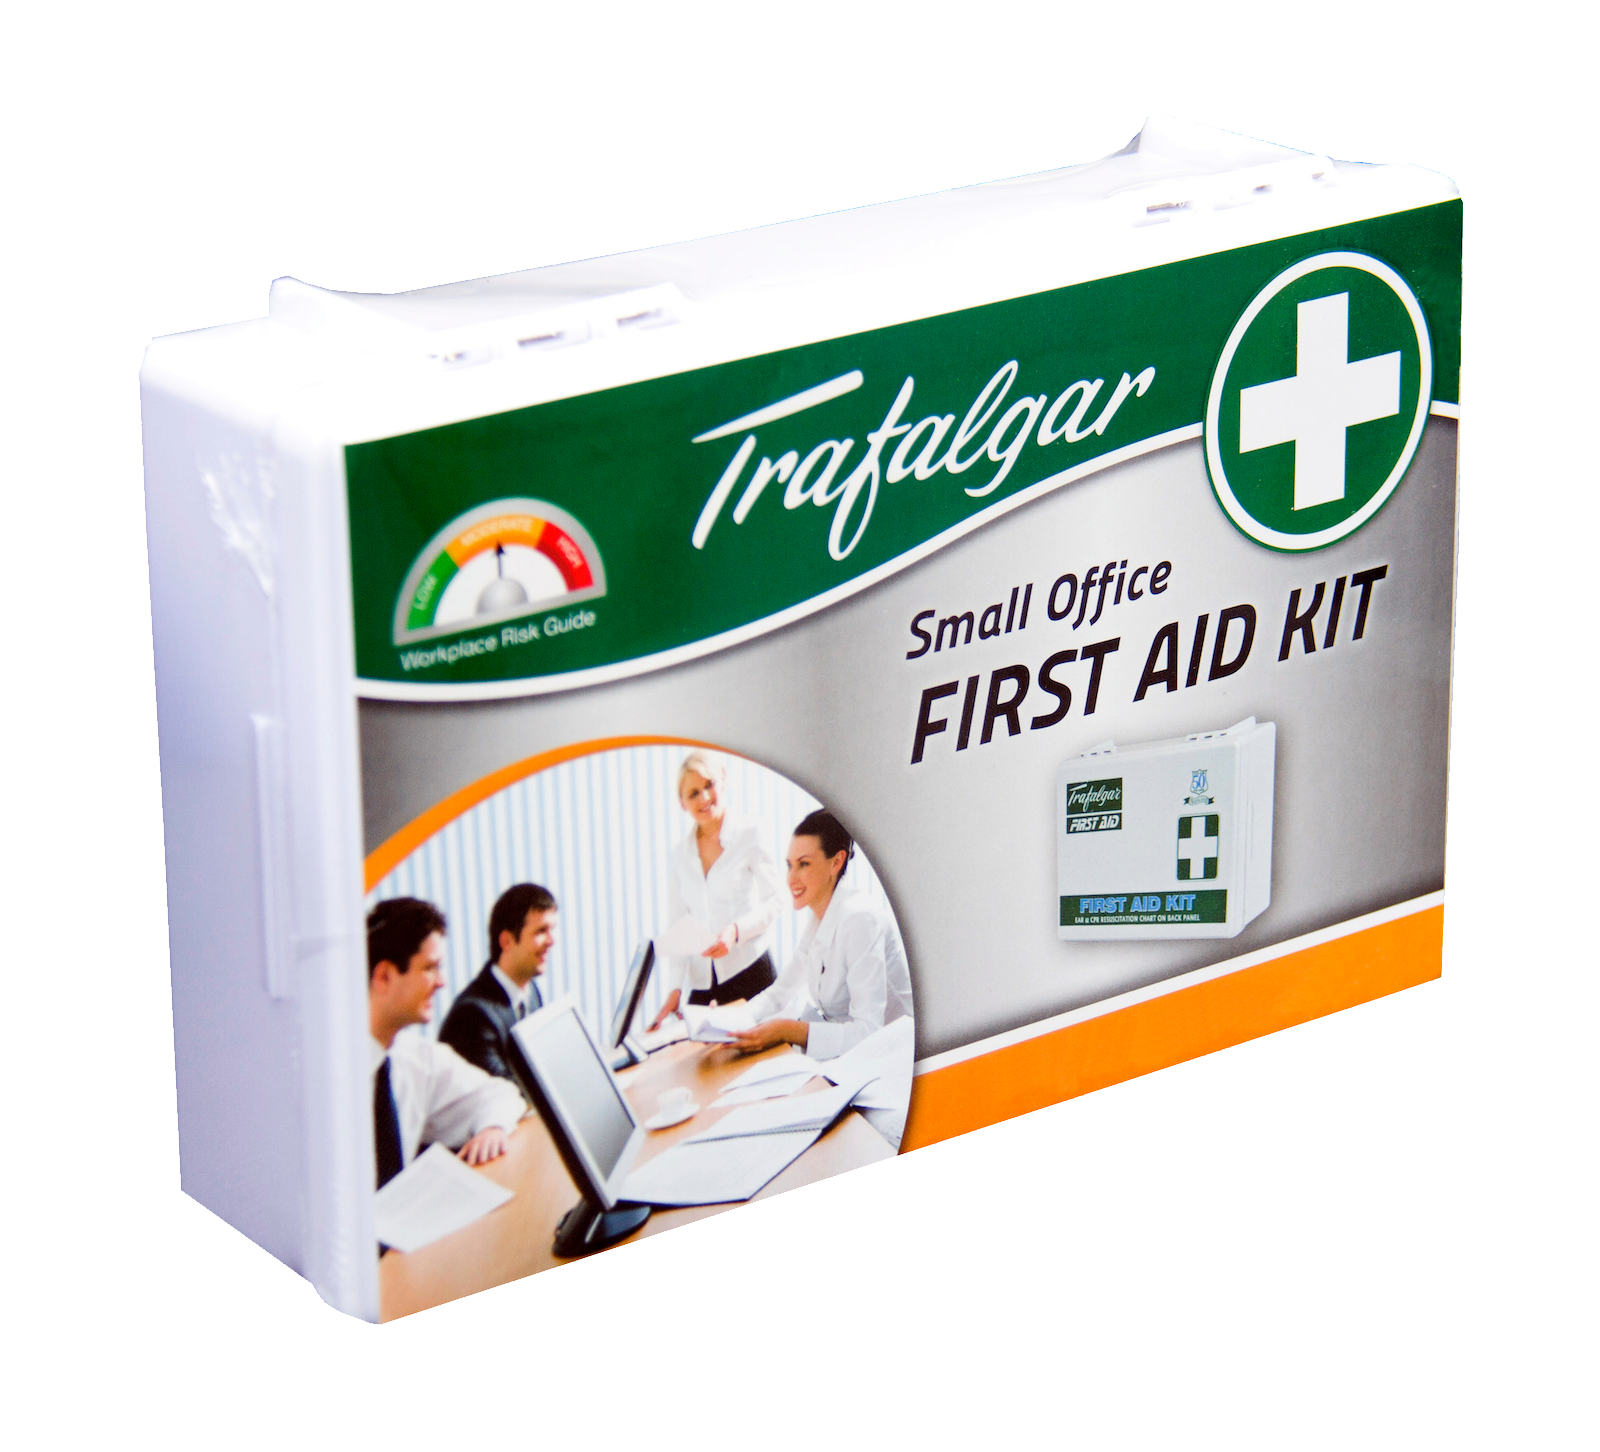 Trafalgar Office First Aid Kit Small